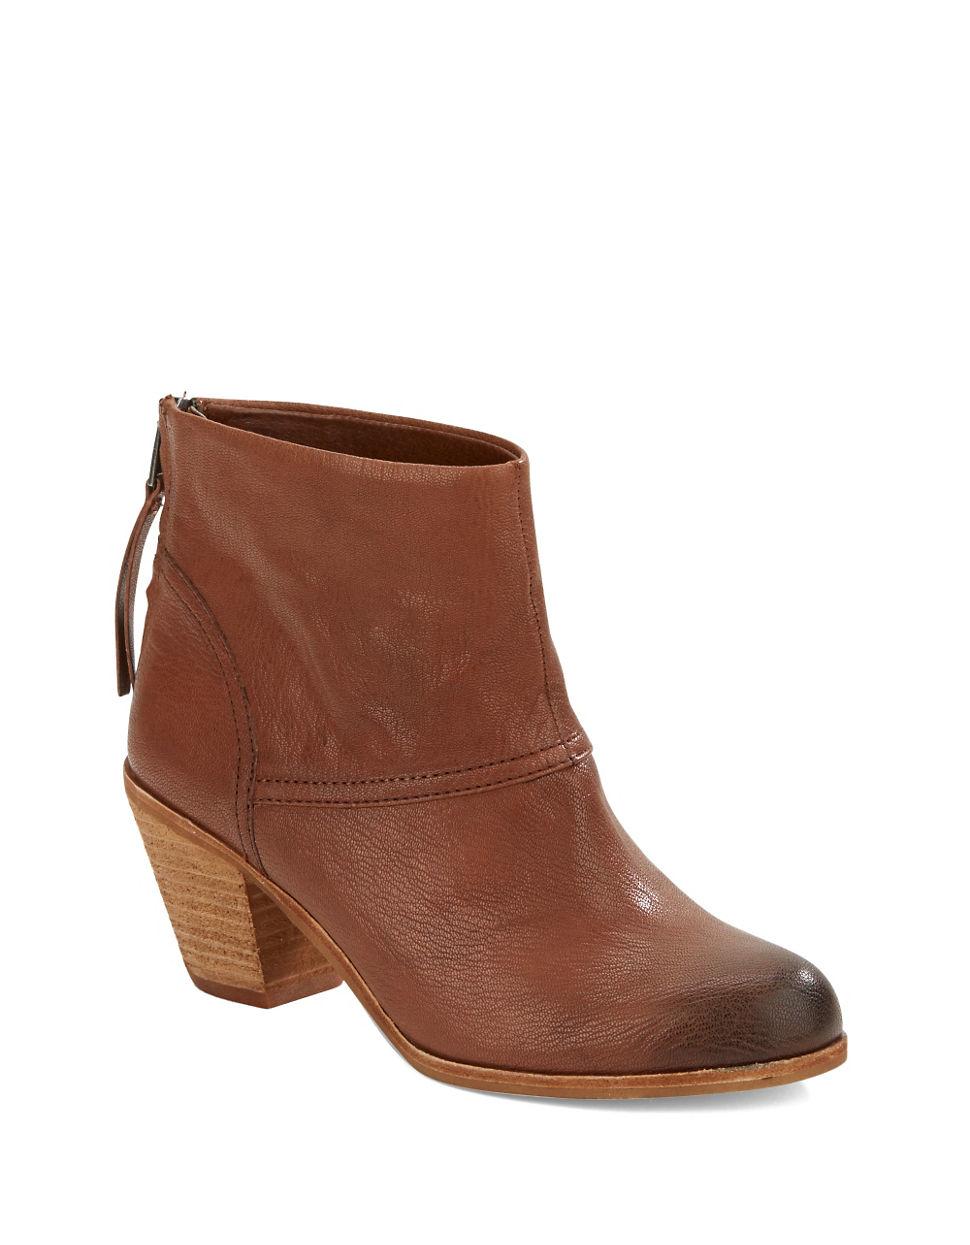 1fa3c63d70d9f Sam Edelman Larkin Leather Booties in Brown - Lyst